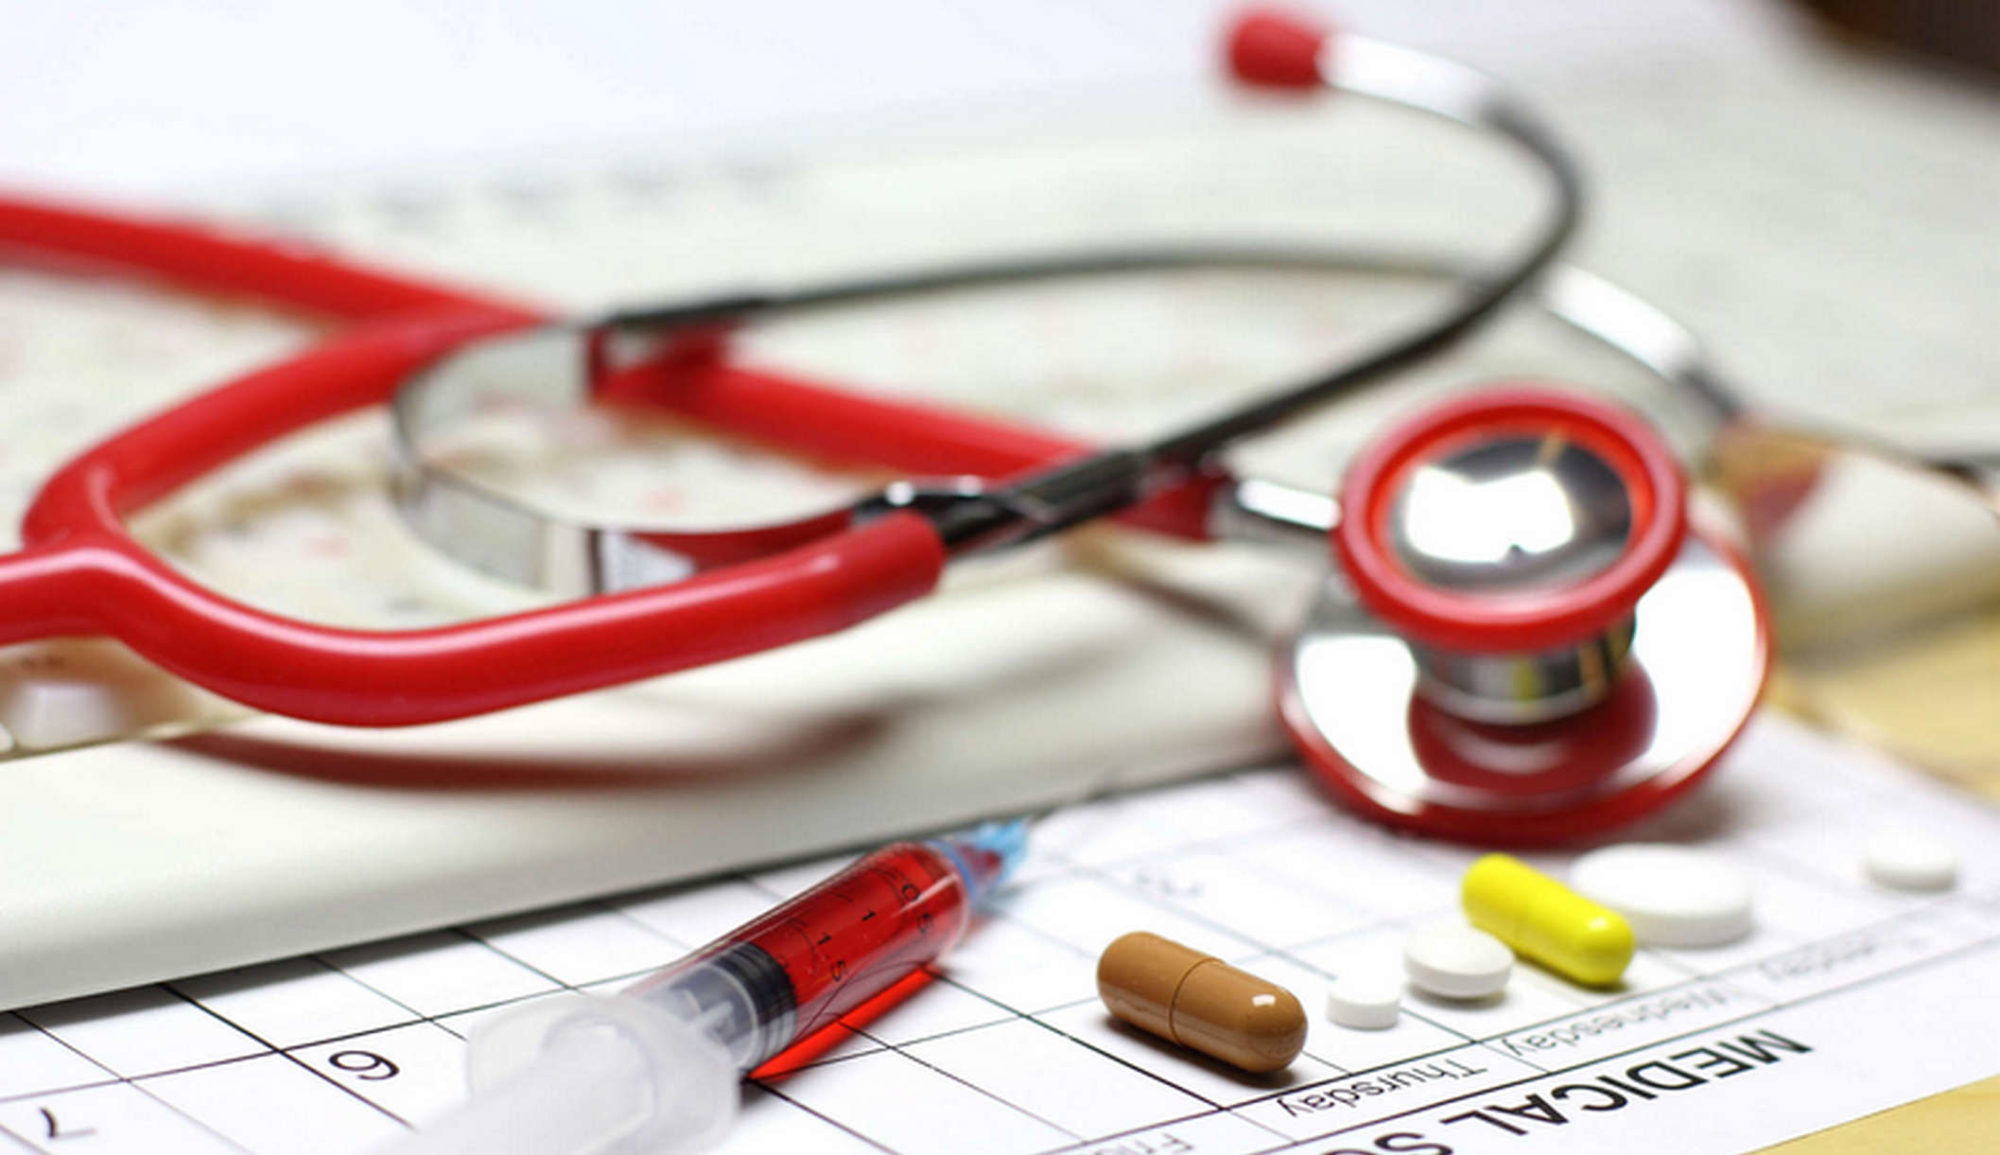 Медична реформа продовжуватиме працювати: Супрун в інтерв'ю ВВС - Уляна Супрун, МОЗ України, медична реформа, лікарі-терапевти, зарплата, екстрена медична допомога - 1 365 2000x1155